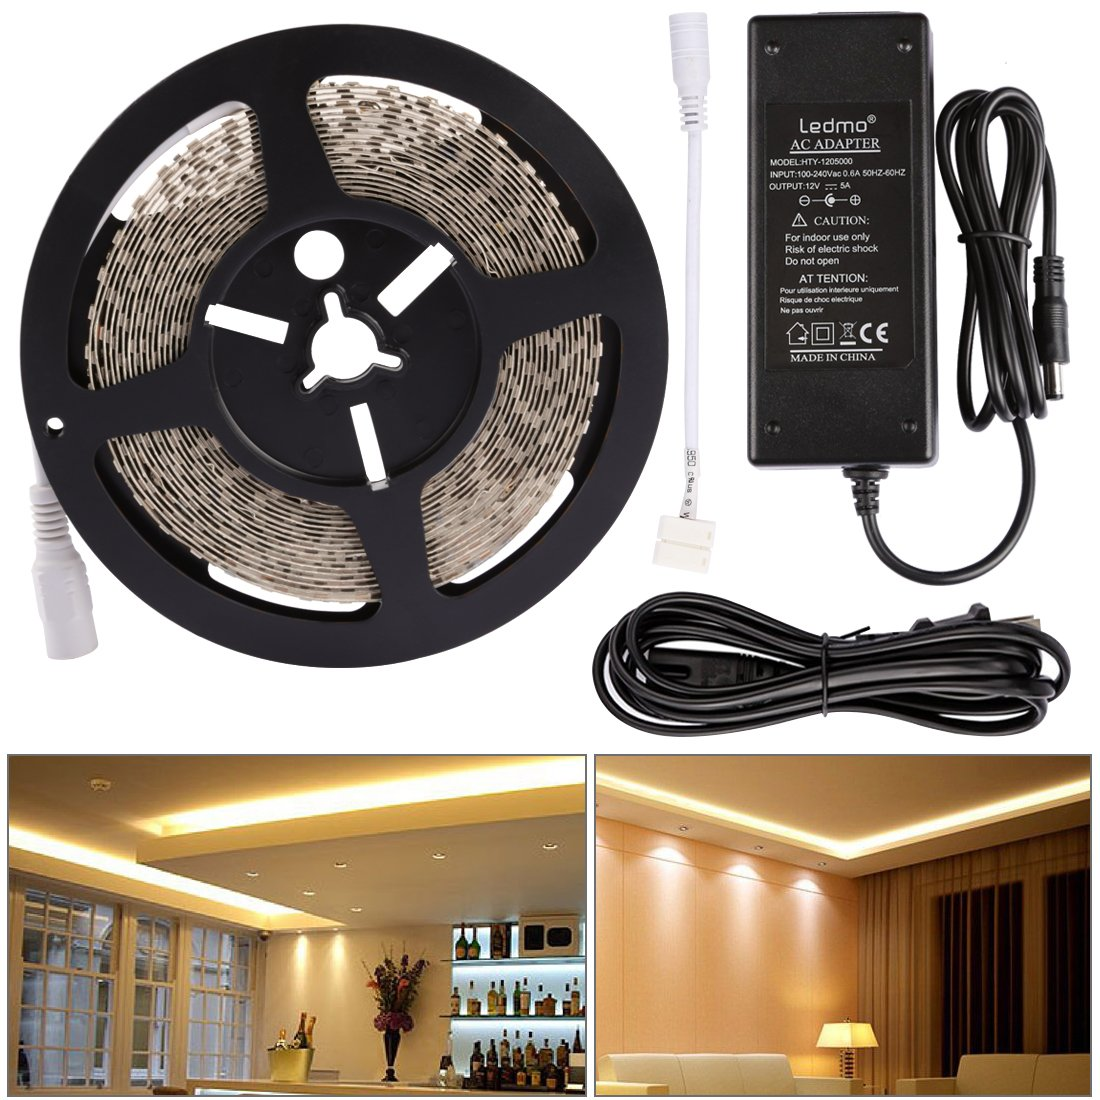 LEDMO LED Light Strip, 600 Units SMD2835 LEDs LED Tape, Warm White 3000K 16.4Ft LED Strip light+DC12V 5A Power Supply